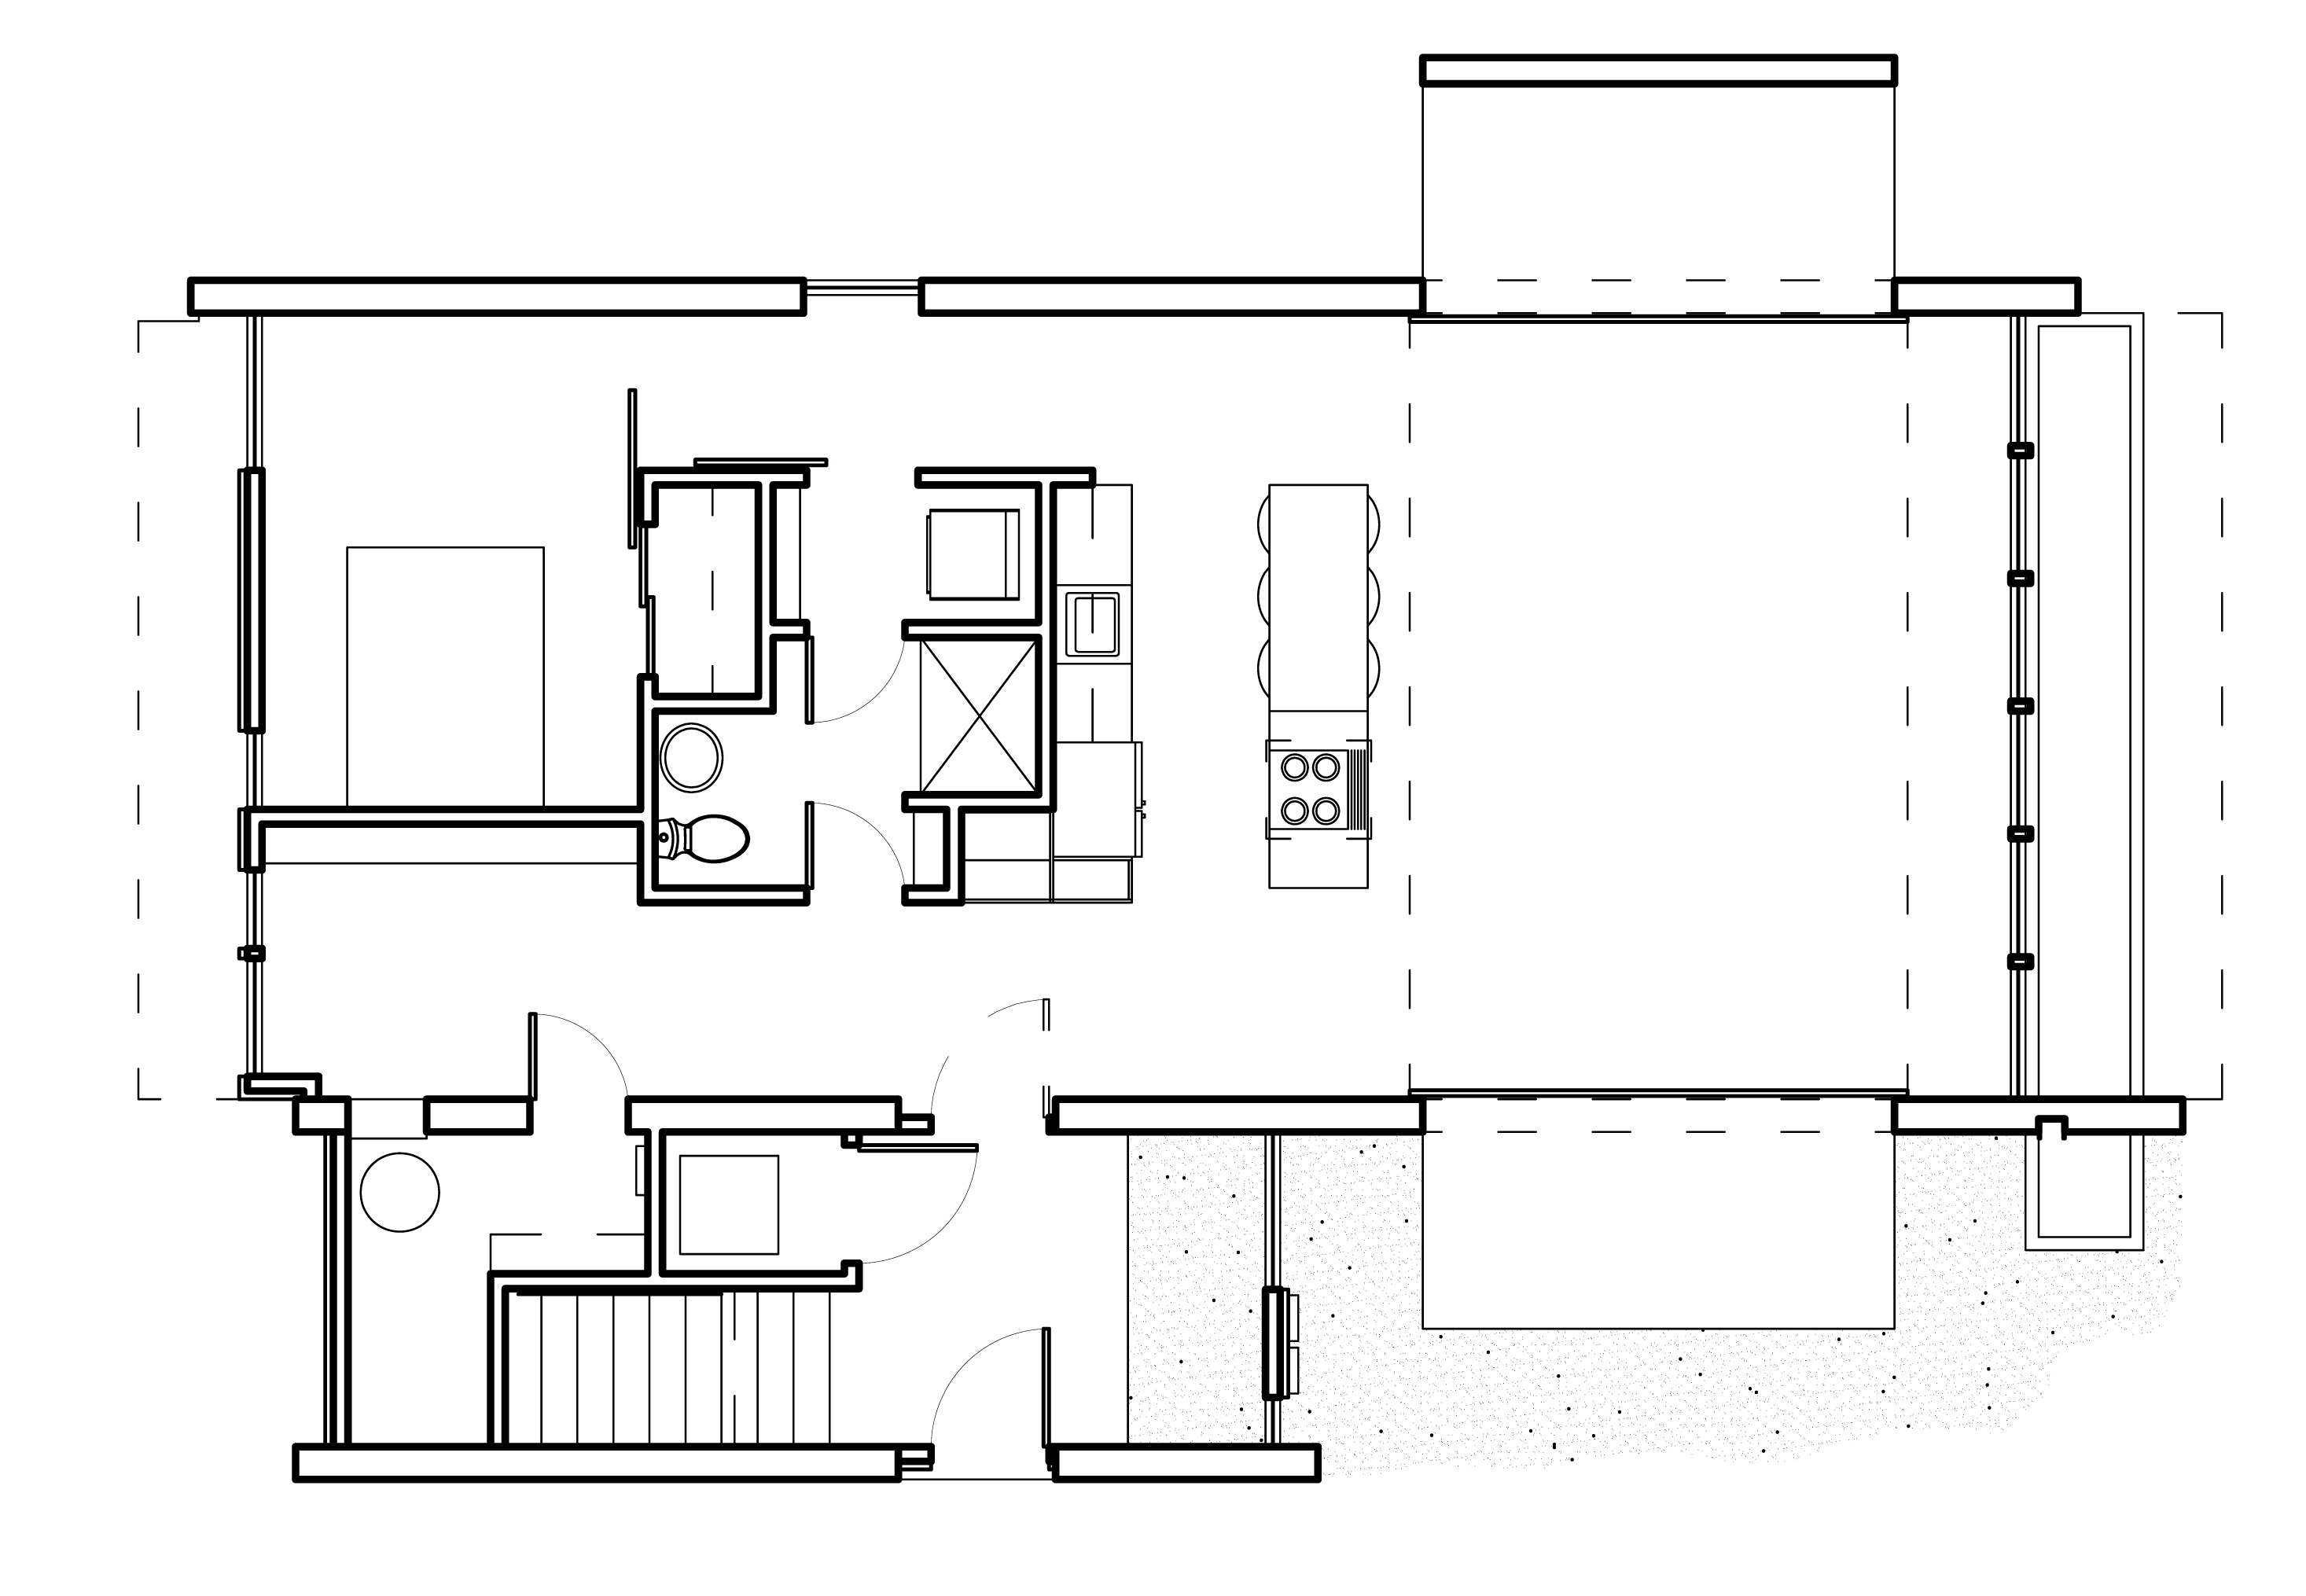 Best Kitchen Gallery: Modern House Plans Contemporary Home Designs Floor Plan 02 of Modern Home Plan Designs  on rachelxblog.com